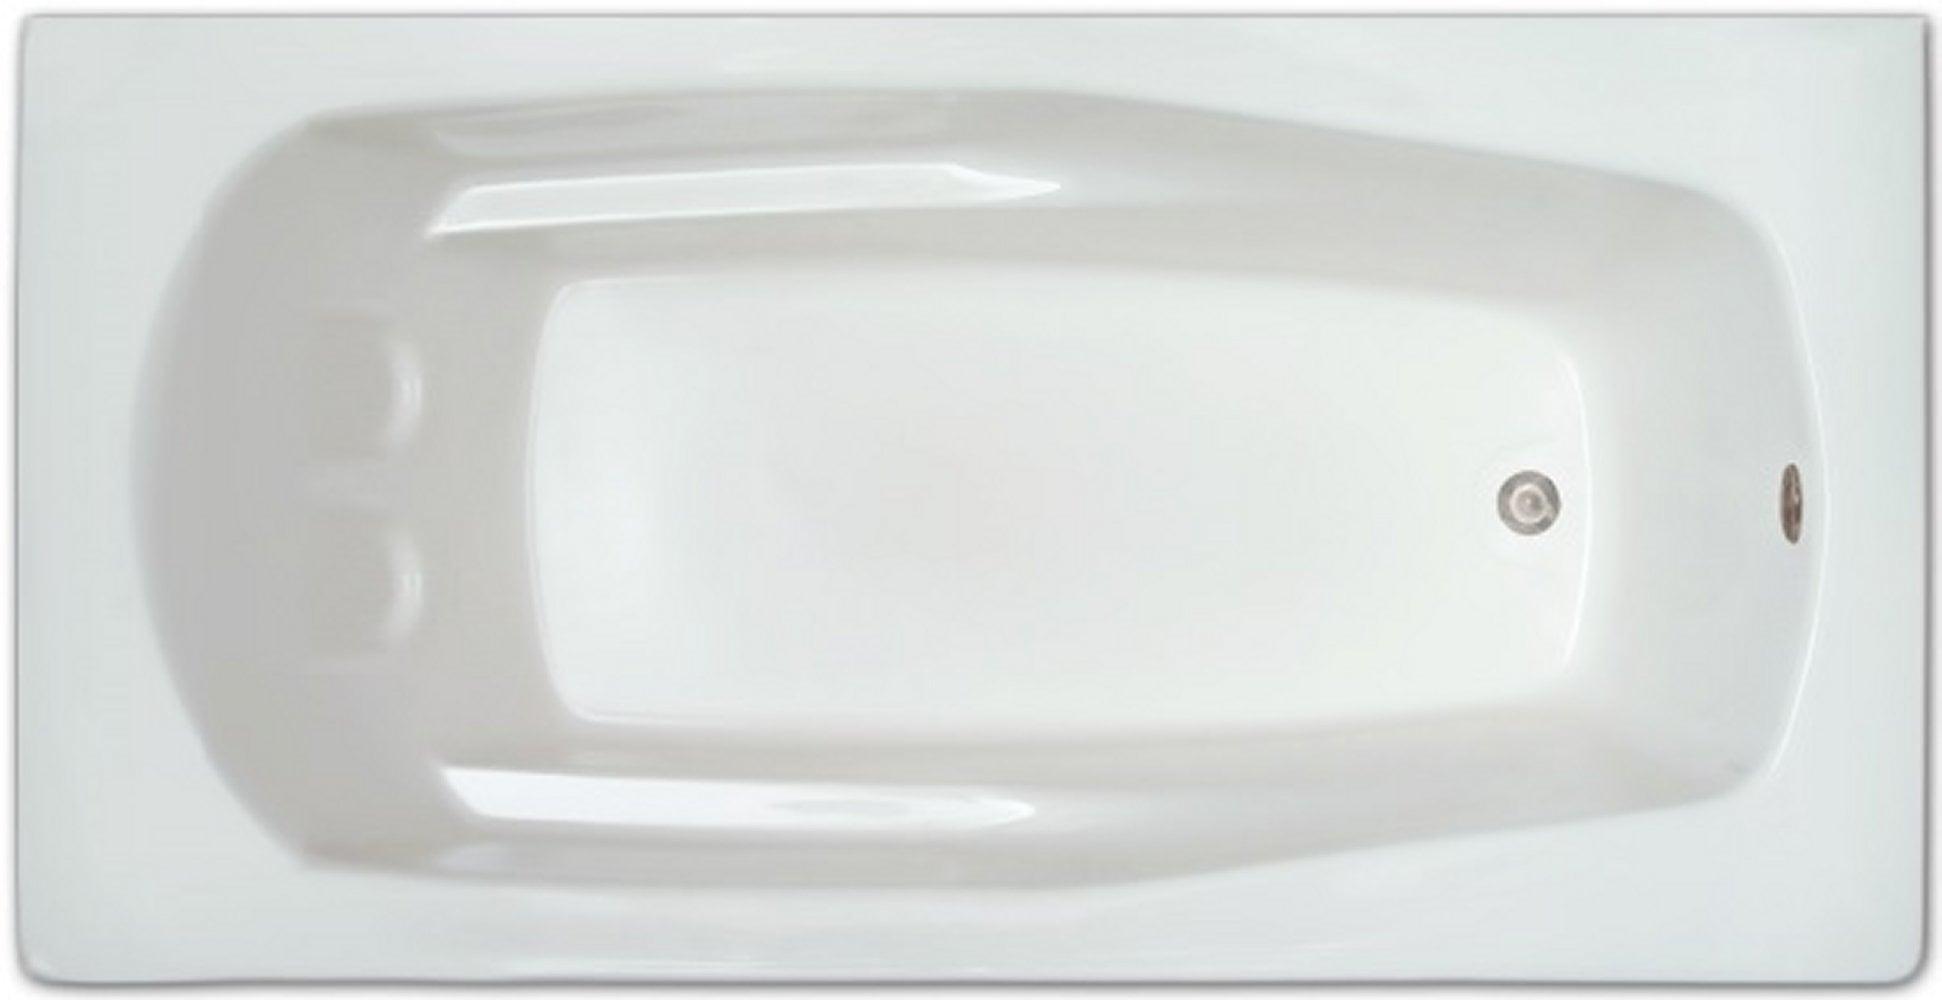 Drop-in Bathtub / 66x32x18.5 / high gloss white acrylic / Rectangle / LPI19-S Pinnacle Bath - Soaker 0